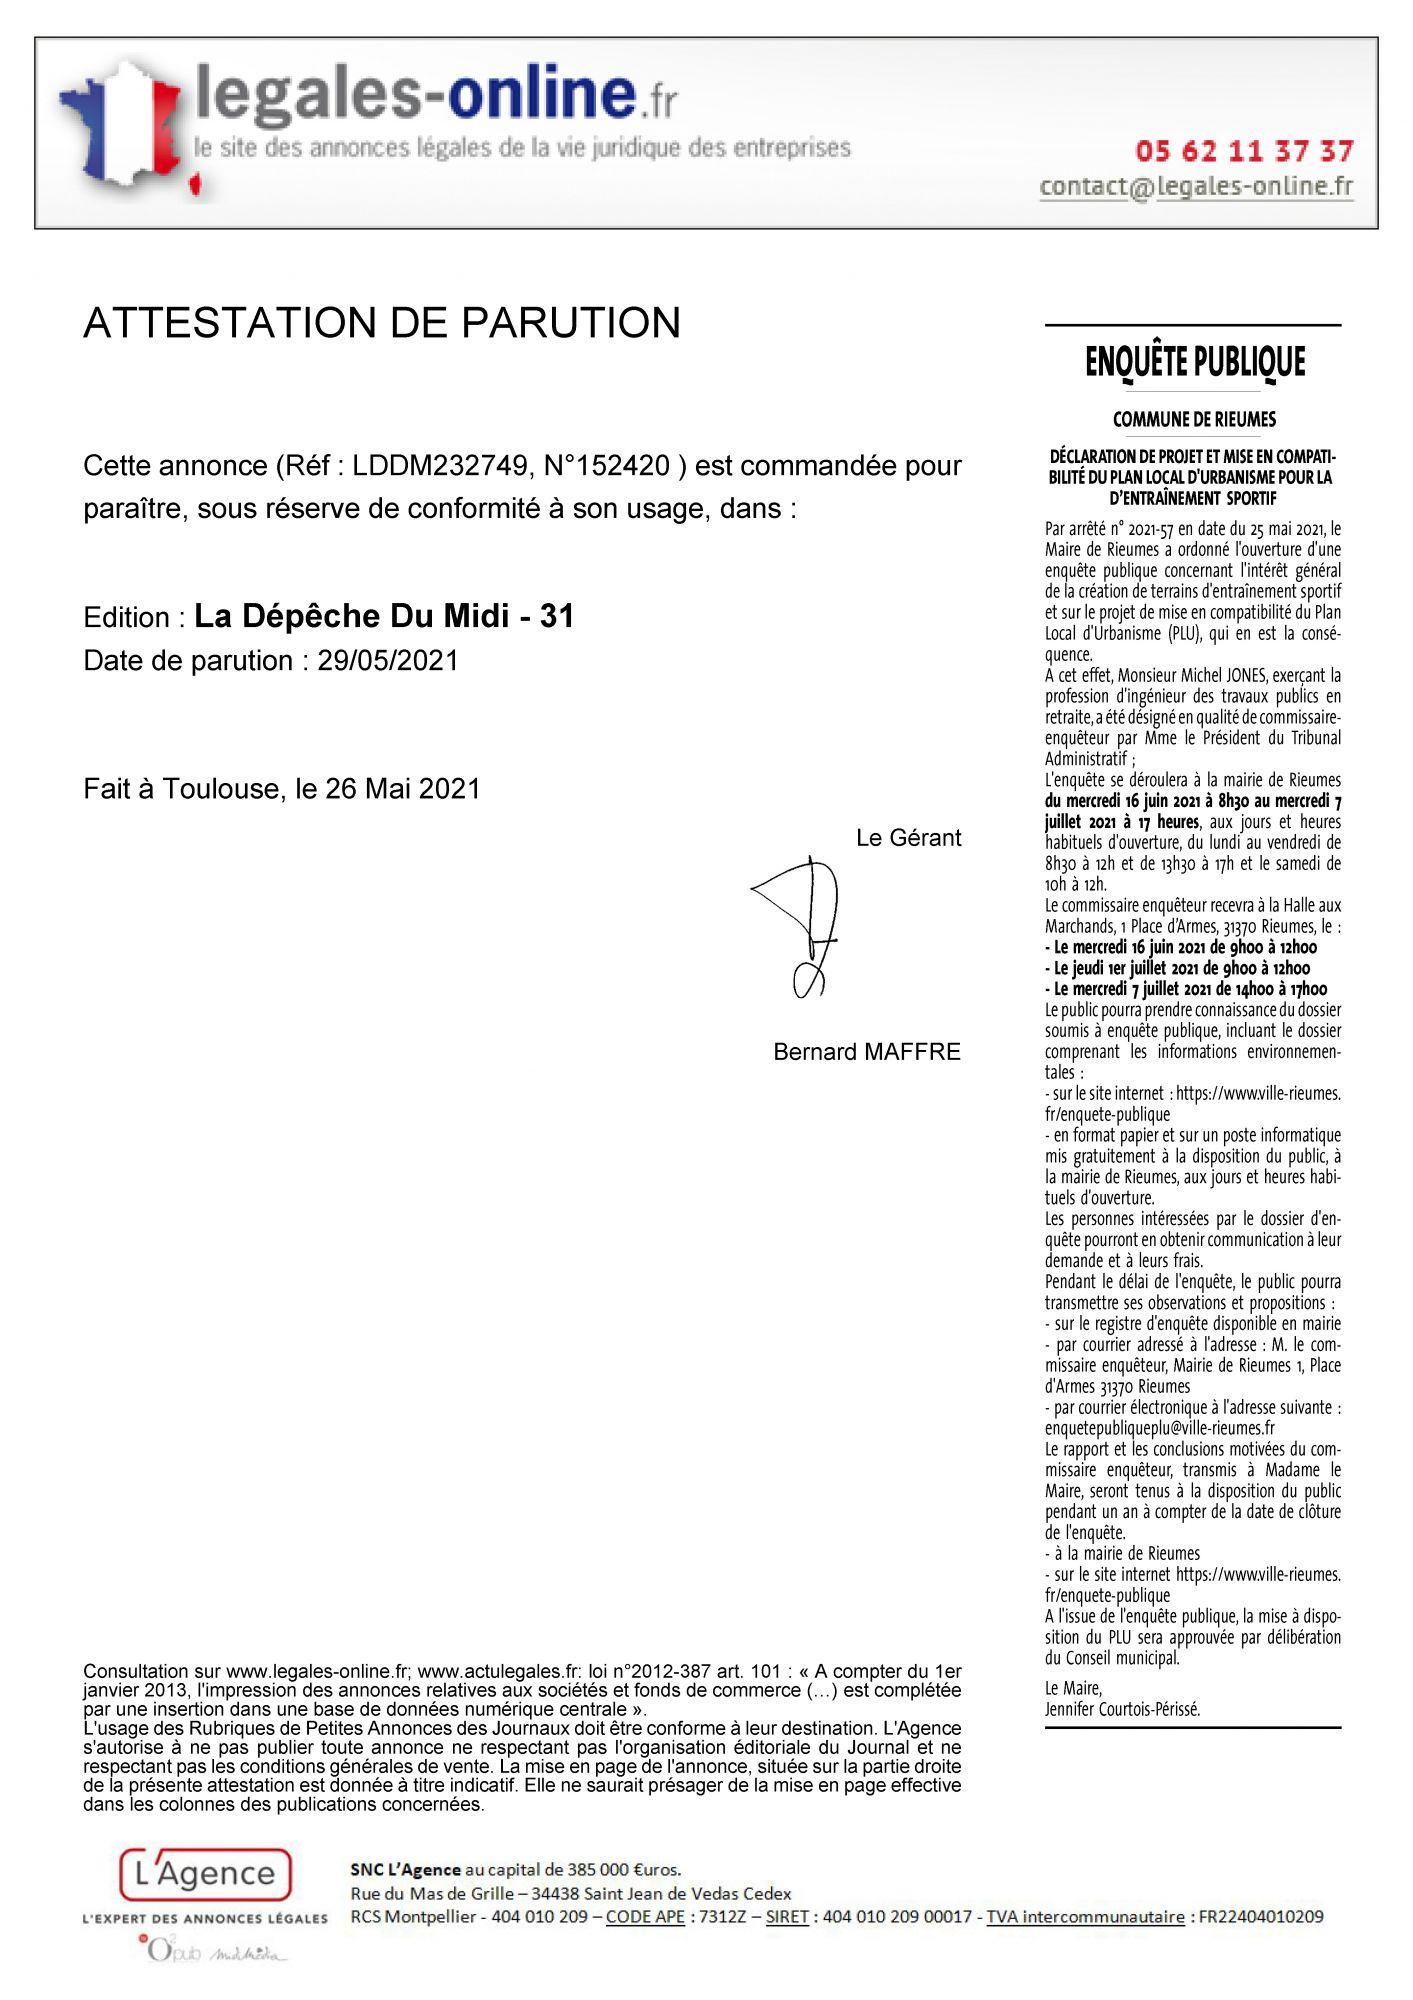 attestation-ss-prix-LDDM232749